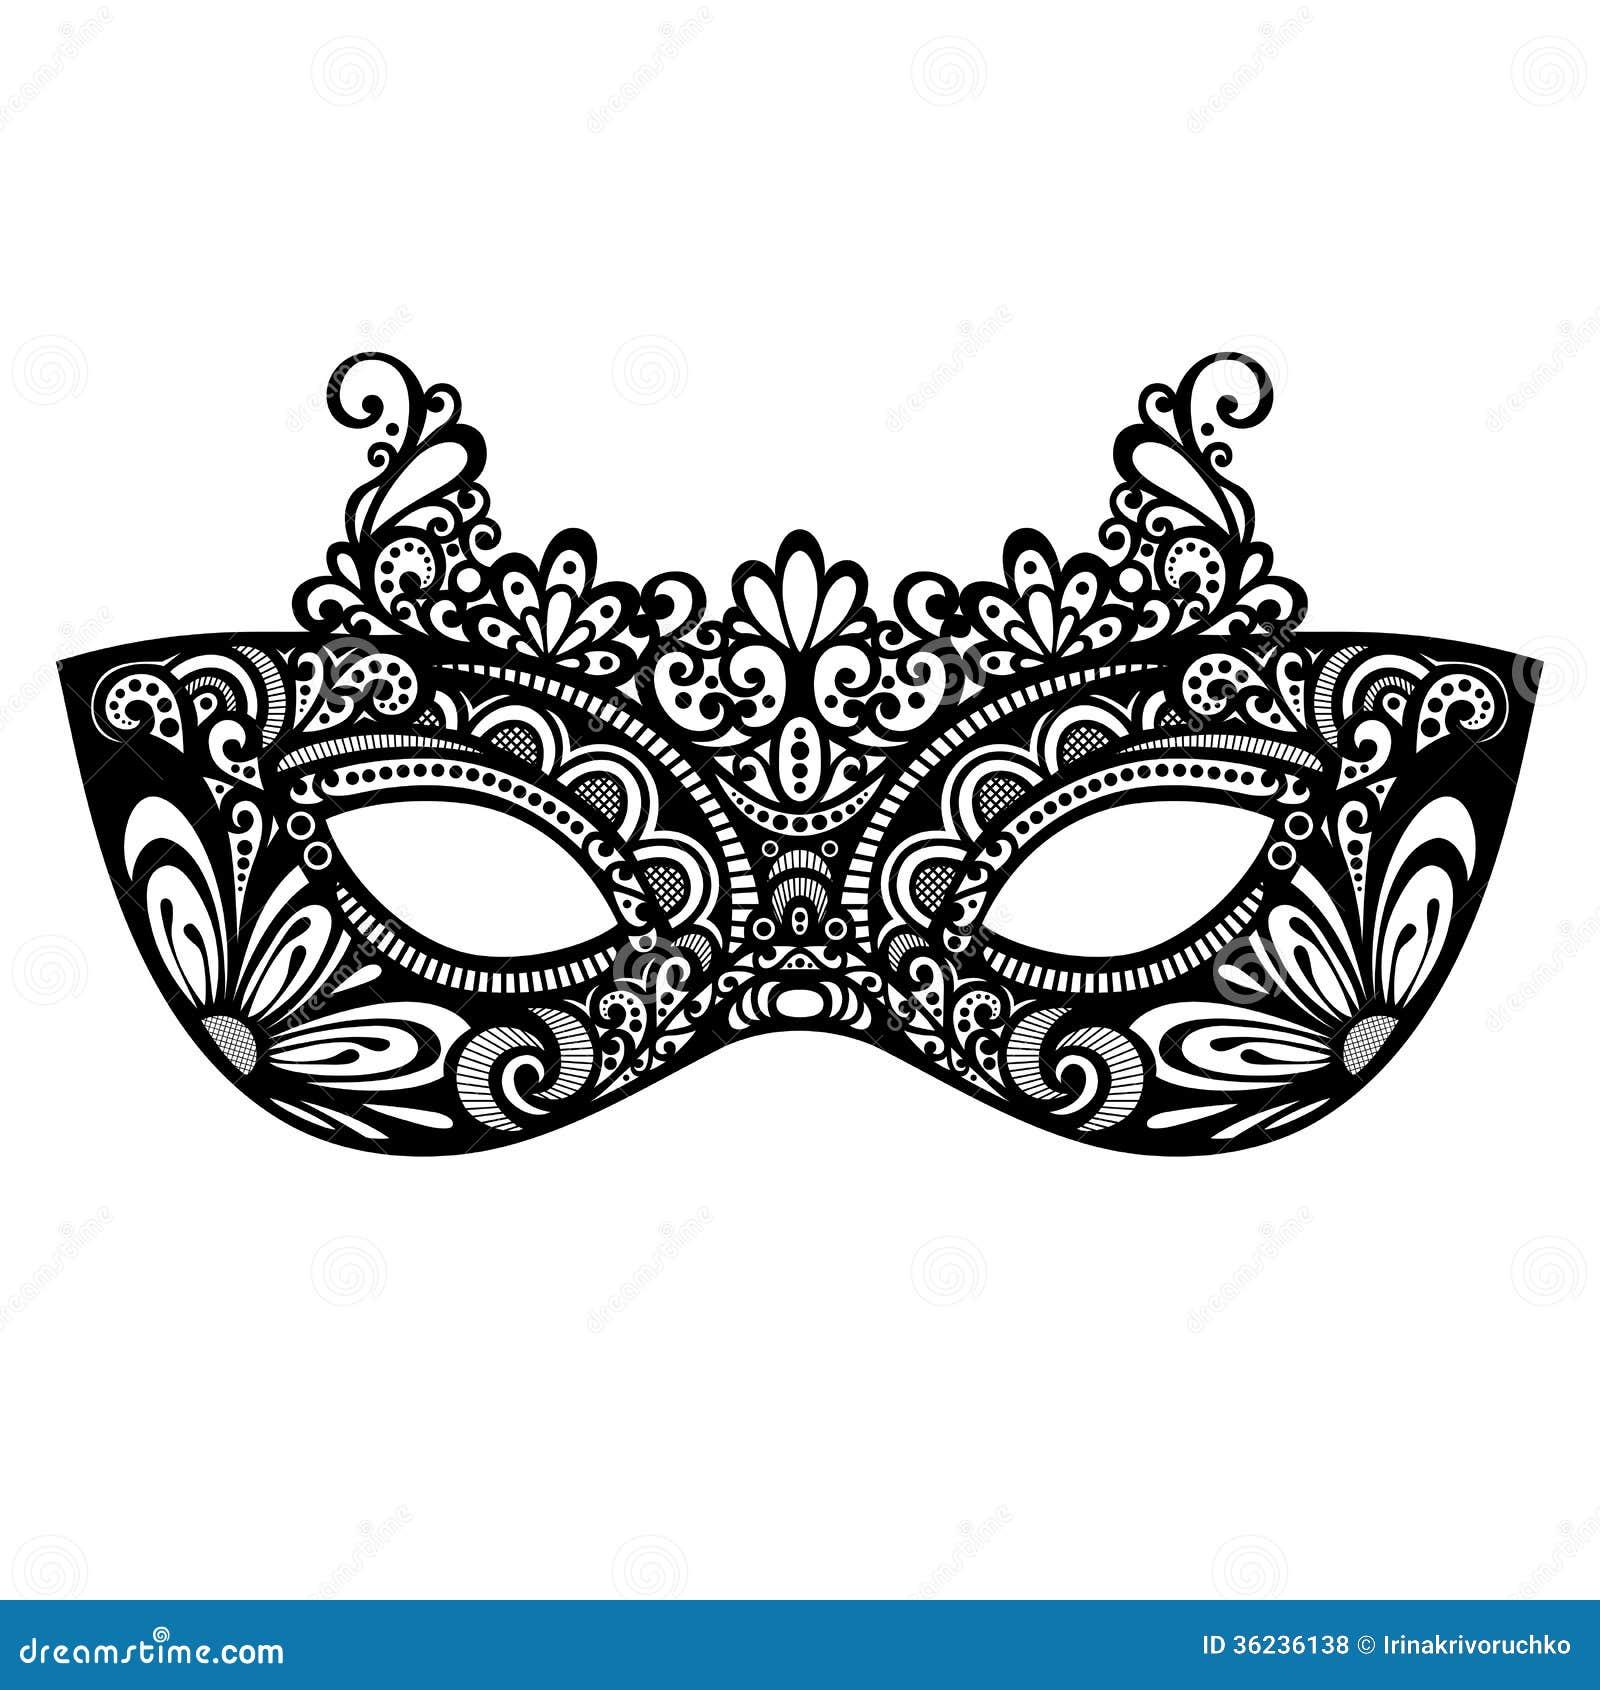 Mask Templete For Masquerade Ball | Search Results | Calendar 2015